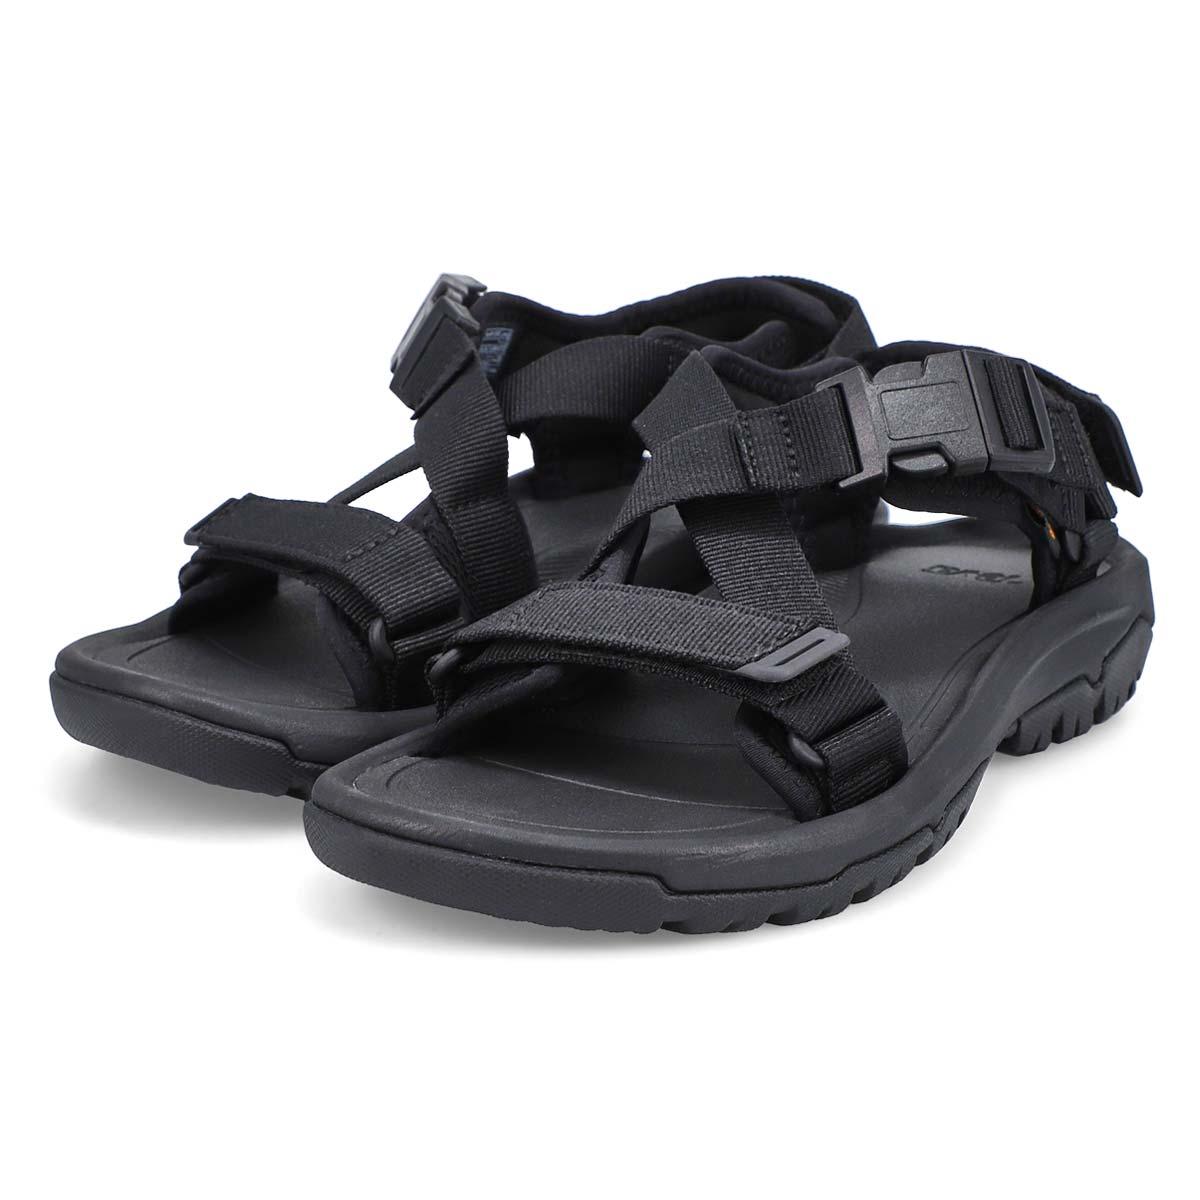 Women's Hurricane Verge Sport Sandal - Black